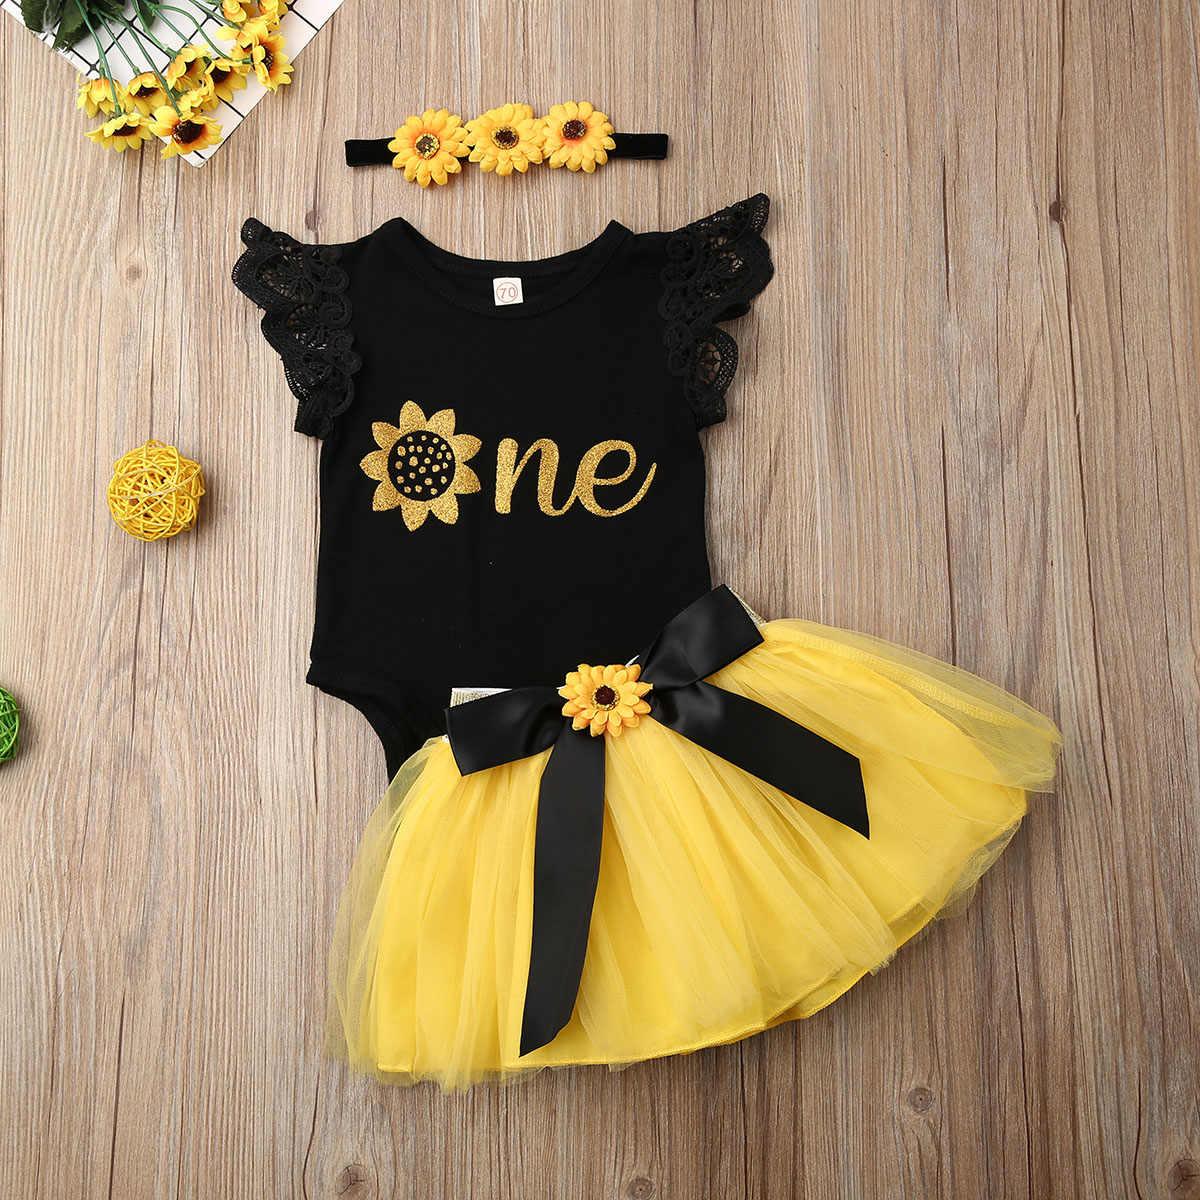 3Pcs Baby Girls Ruffled Plaid Jumpsuit Romper Tops Tutu Tulle Skirt Headband Set